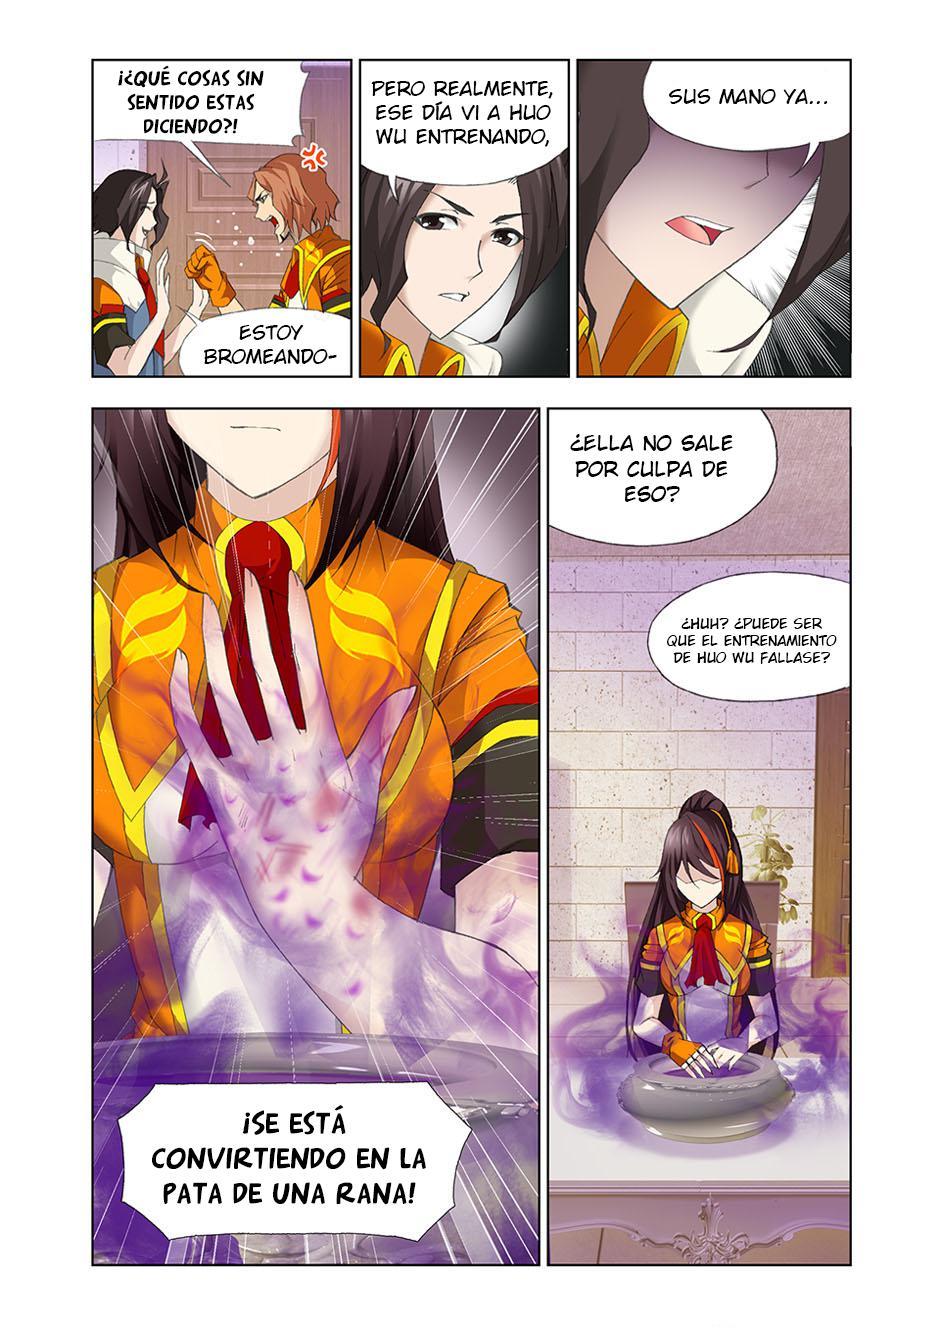 http://c5.ninemanga.com/es_manga/18/16210/417363/ca1305ba0cdbb2805ed431c3adc47b20.jpg Page 7